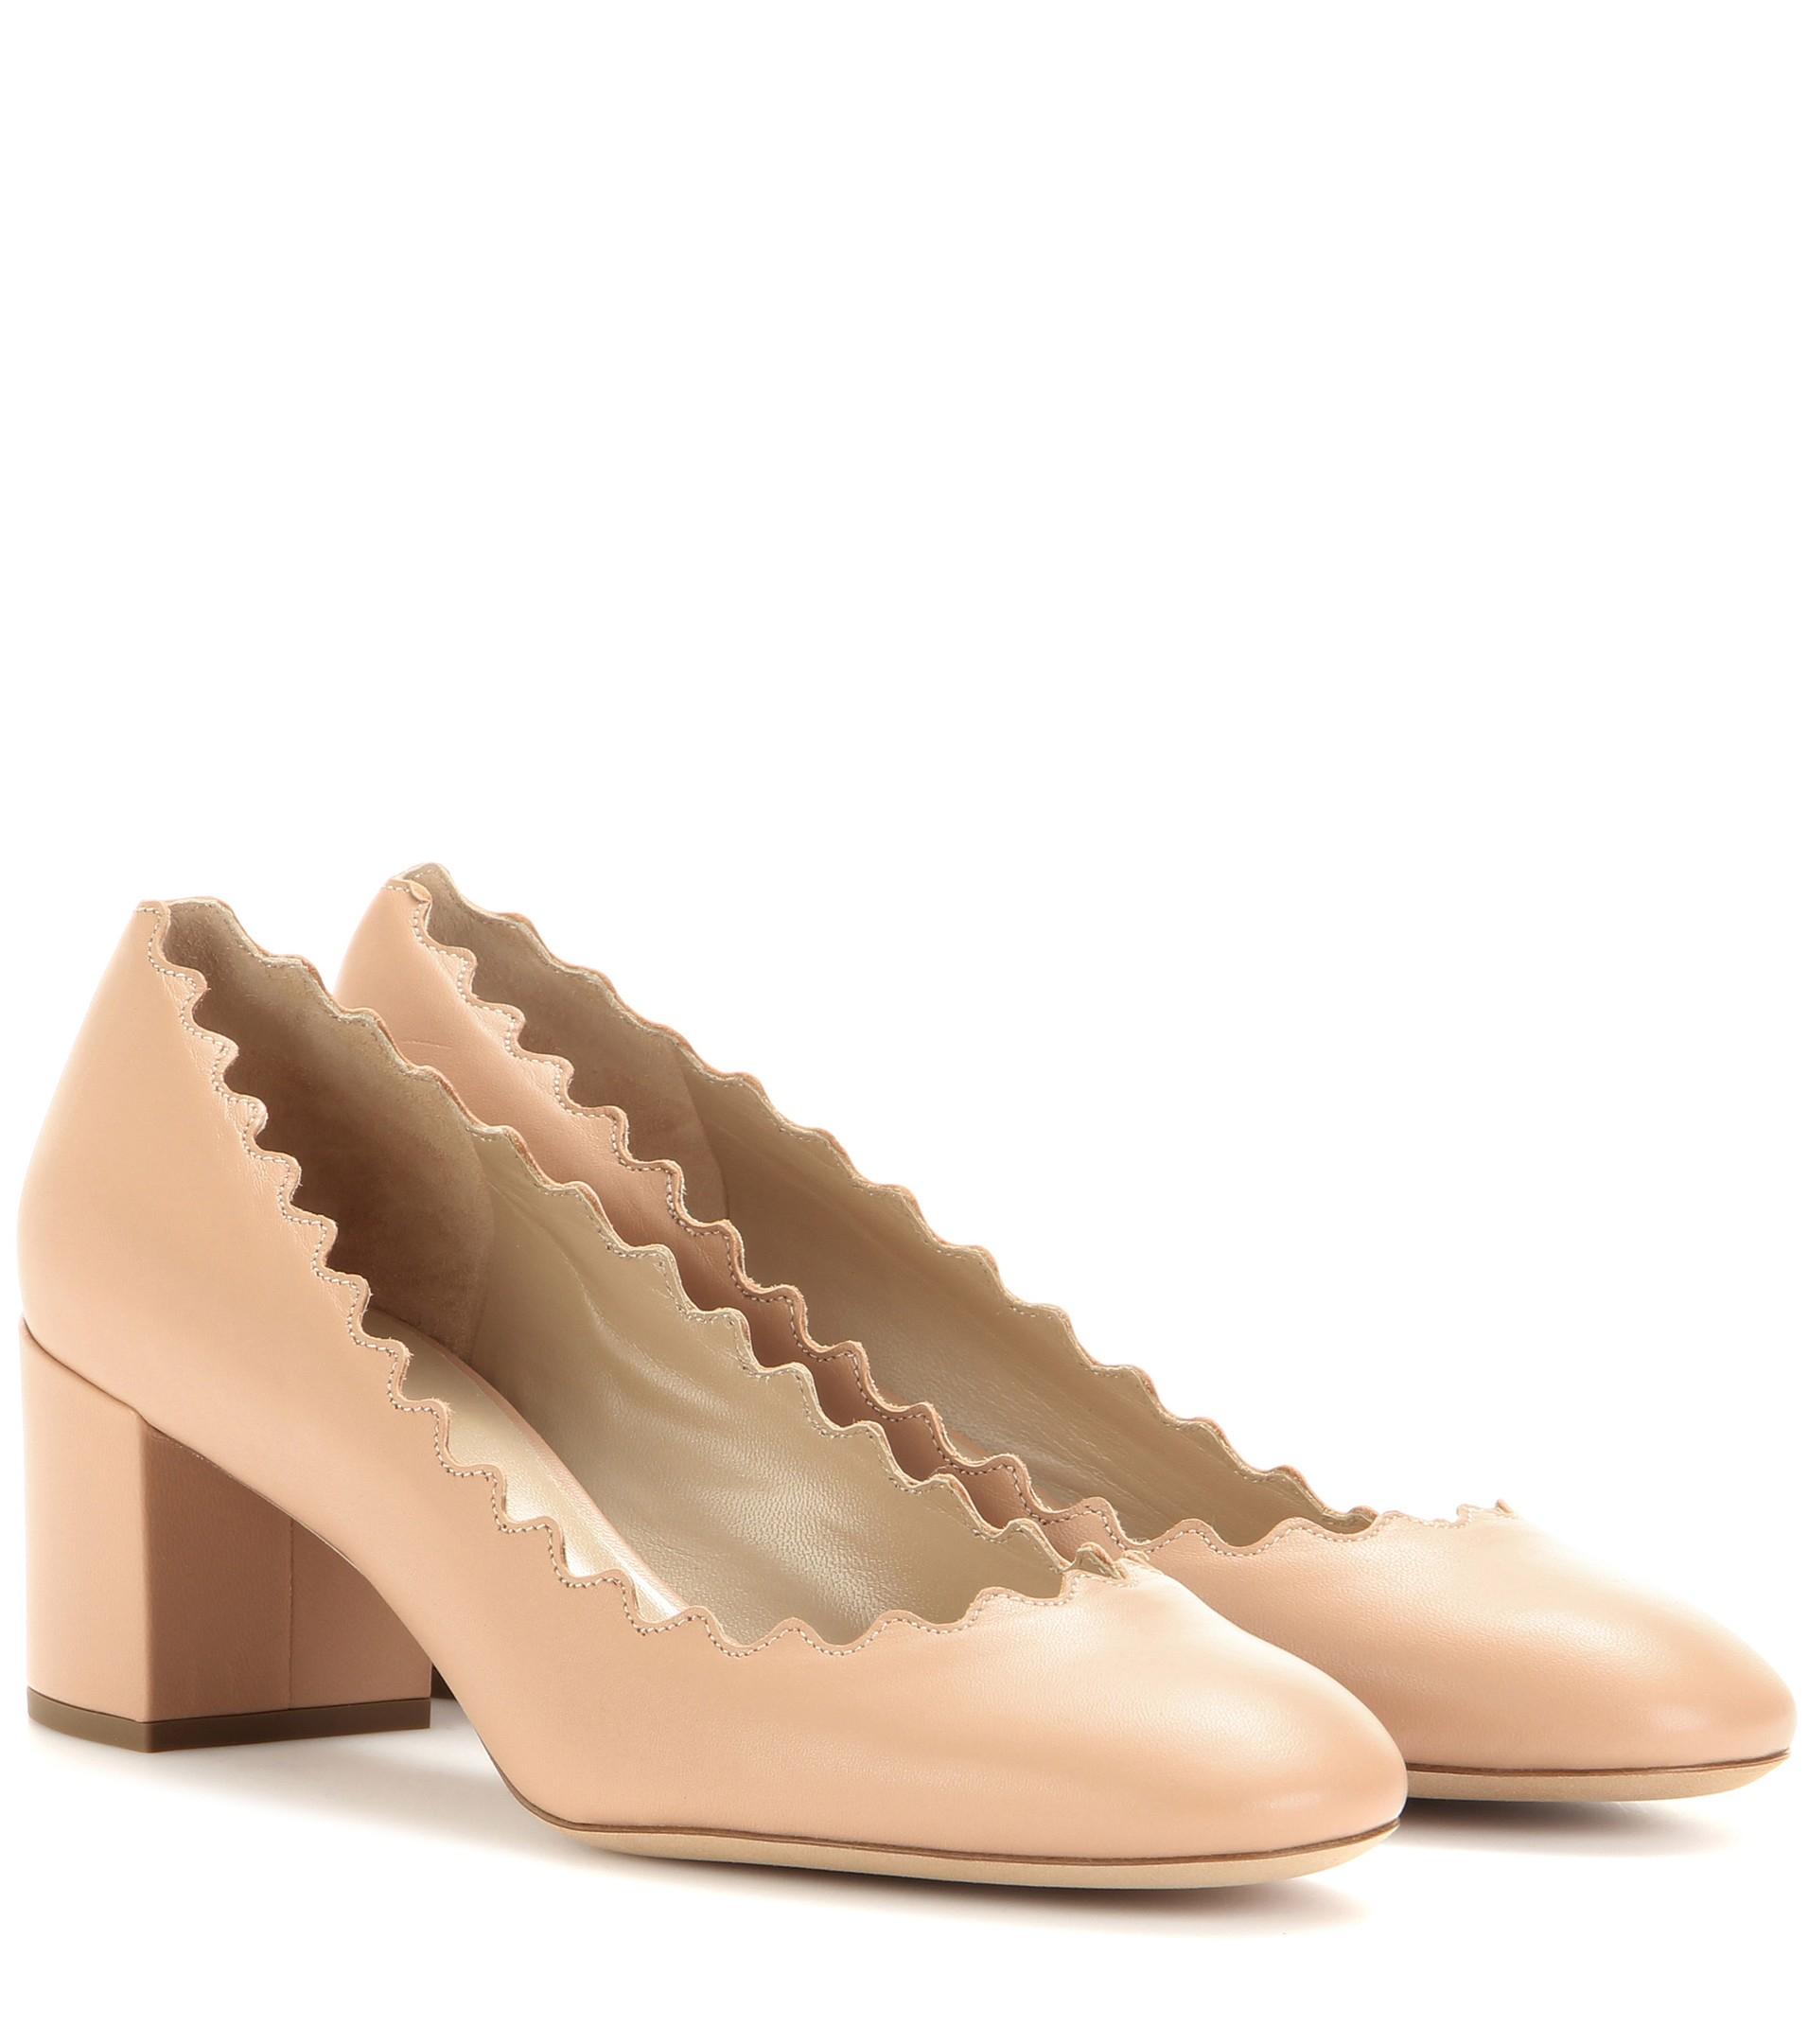 Lauren ankle strap pump - Nude & Neutrals Chlo�� wUSNn1aEmW